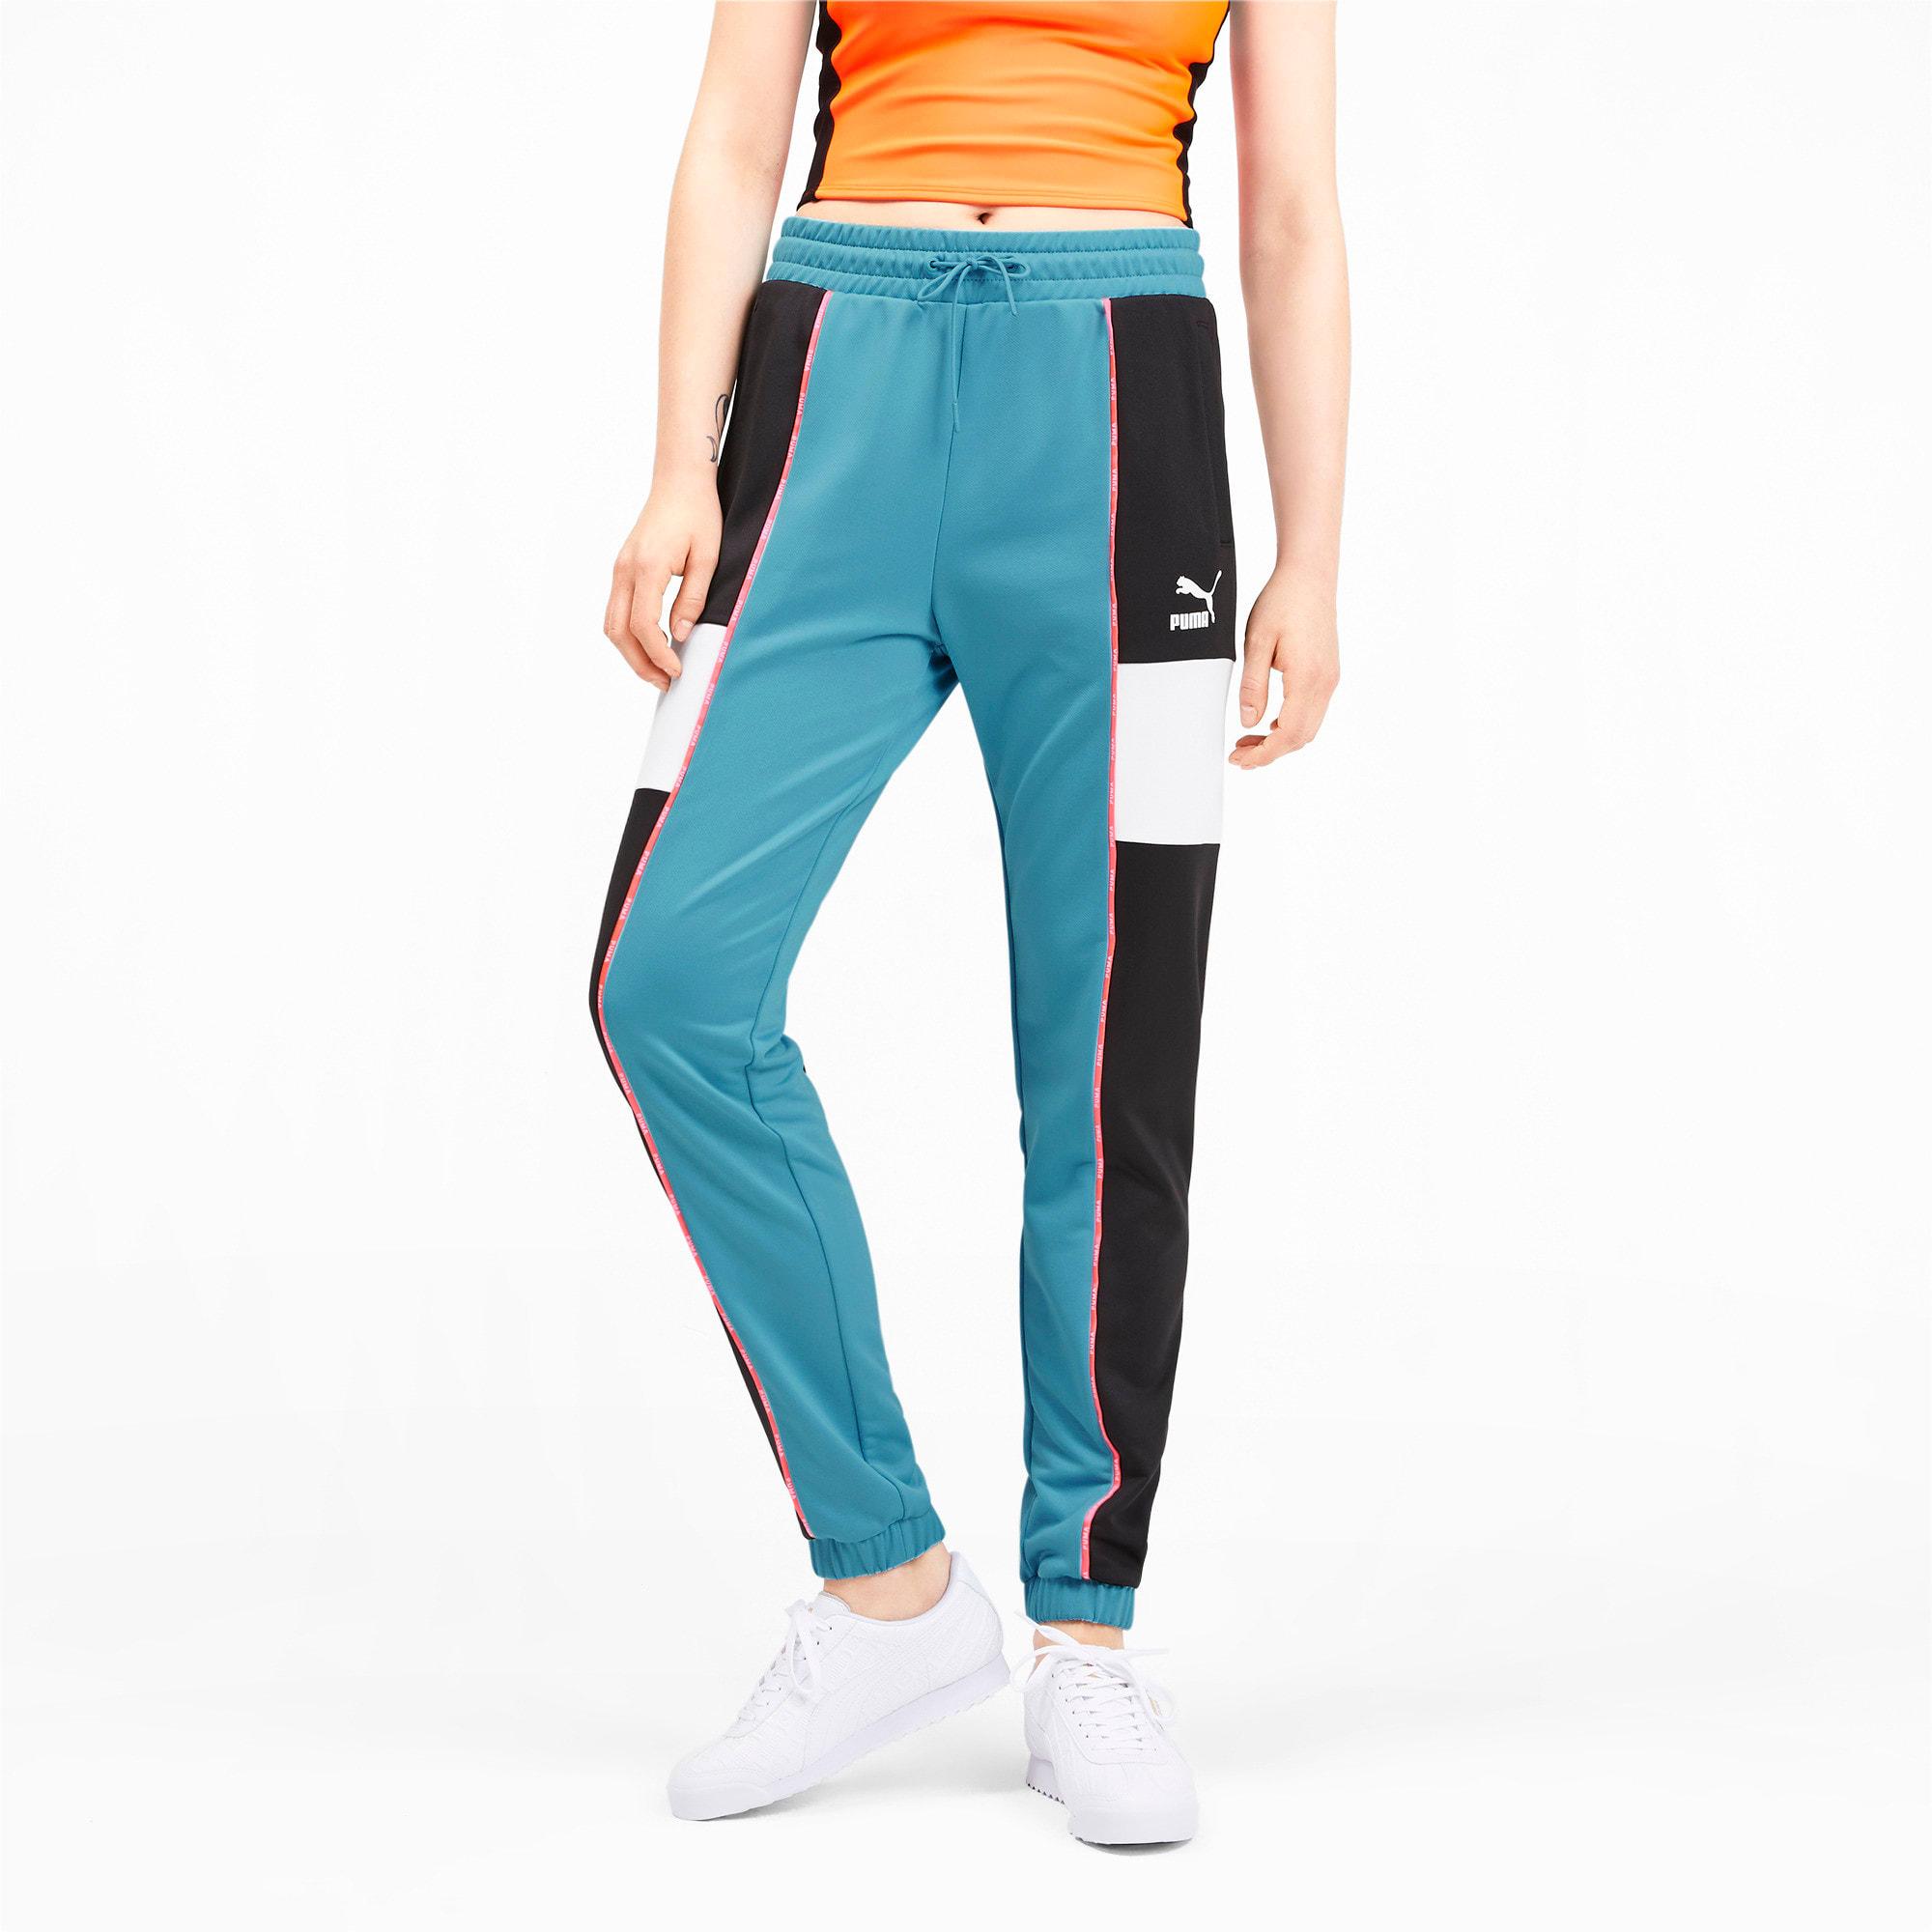 Miniatura 1 de Pantalones deportivos PUMA XTG para mujer, Milky Blue, mediano